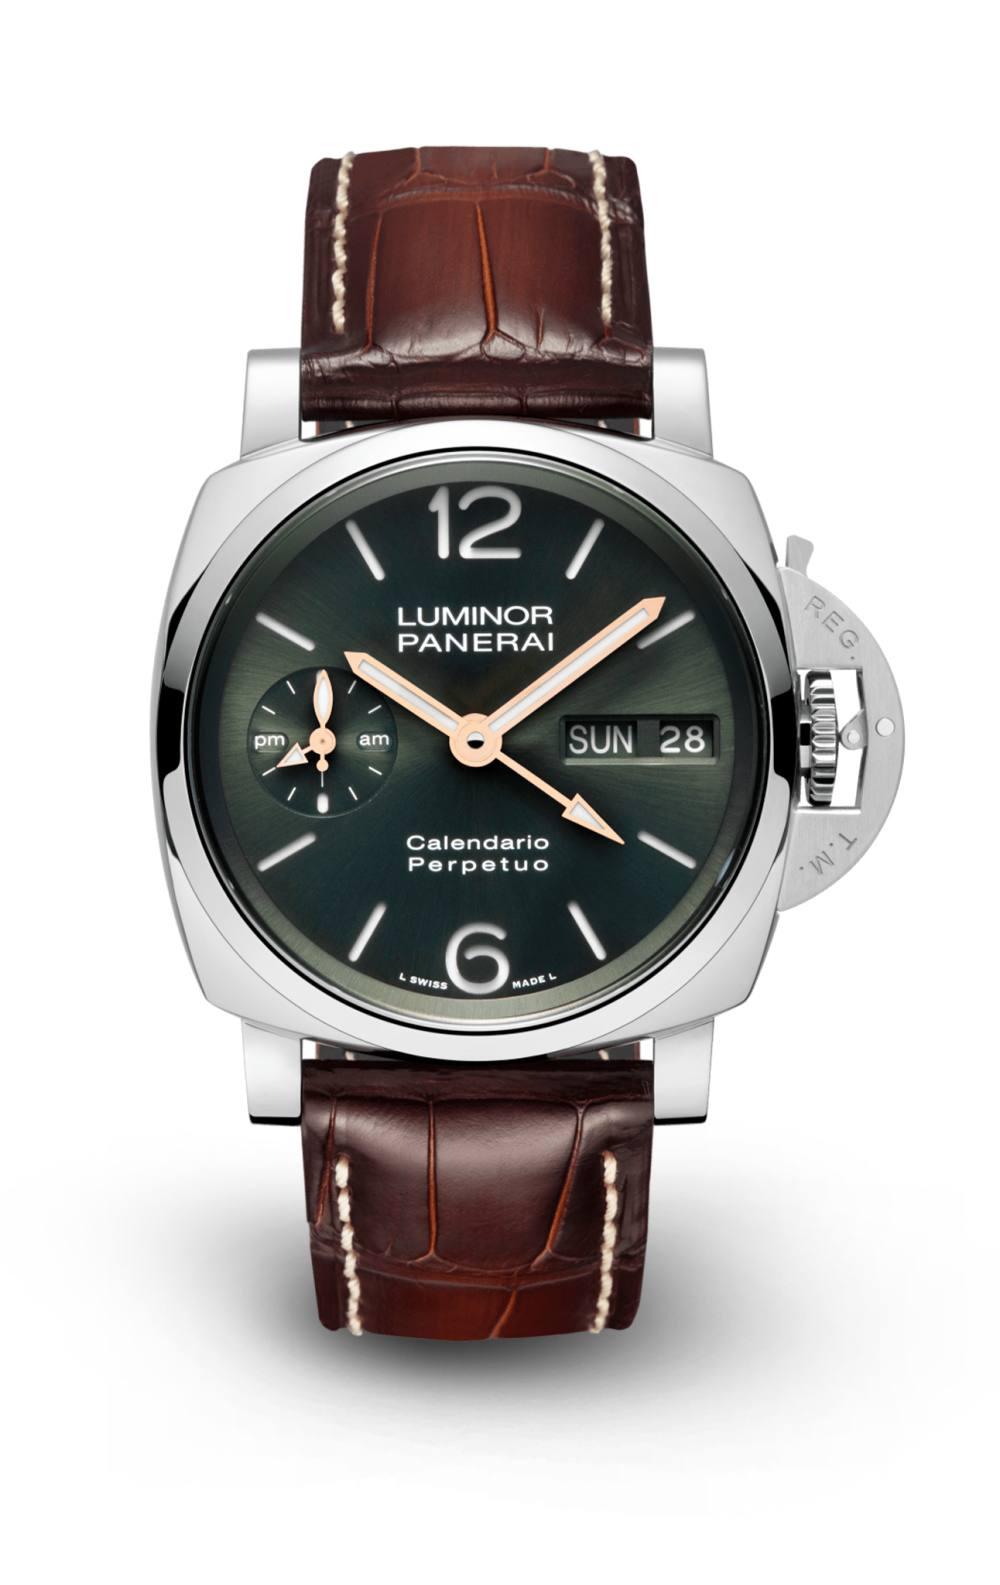 luminor perpetual calendar platinumtech - Panerai 全新万年历腕表,实现了腕表新程度的复杂功能性